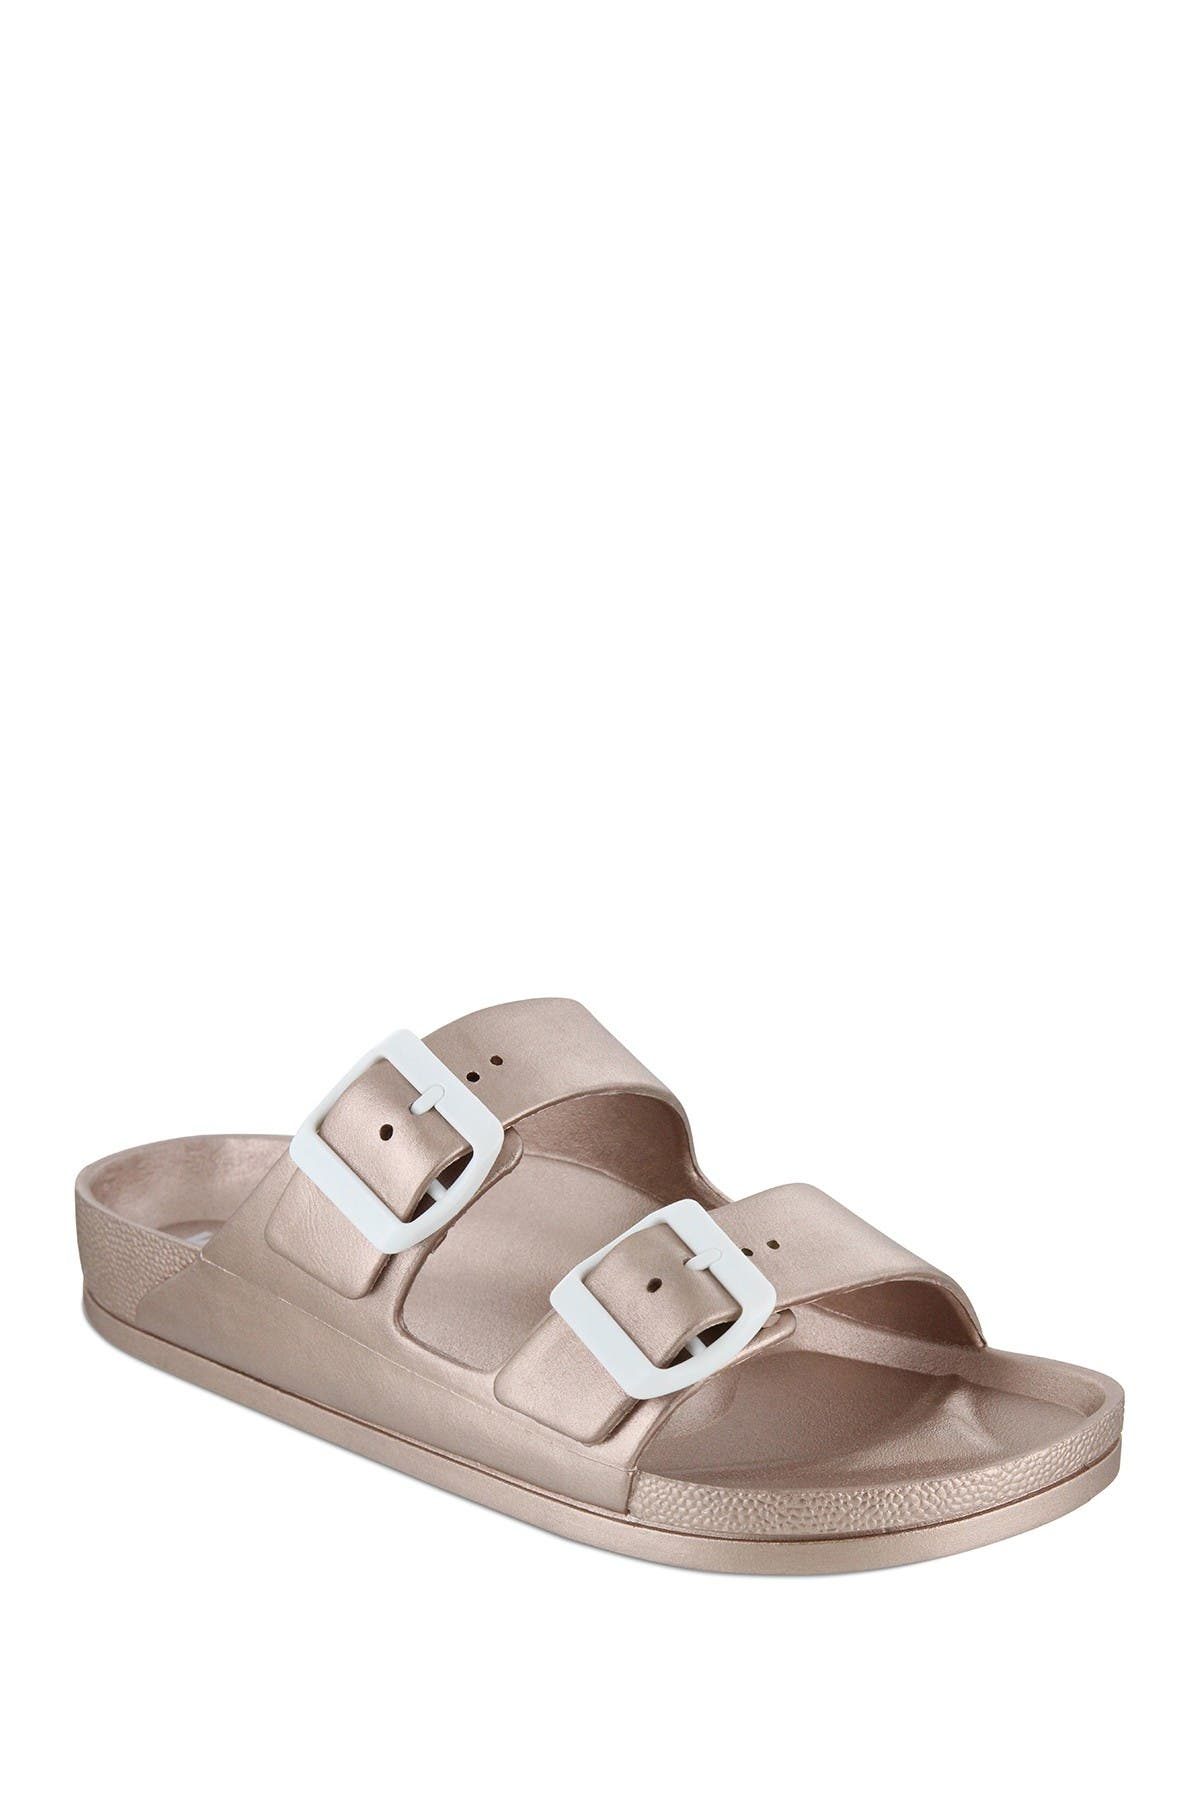 MIA | Jasmin Dual Buckle Sandal